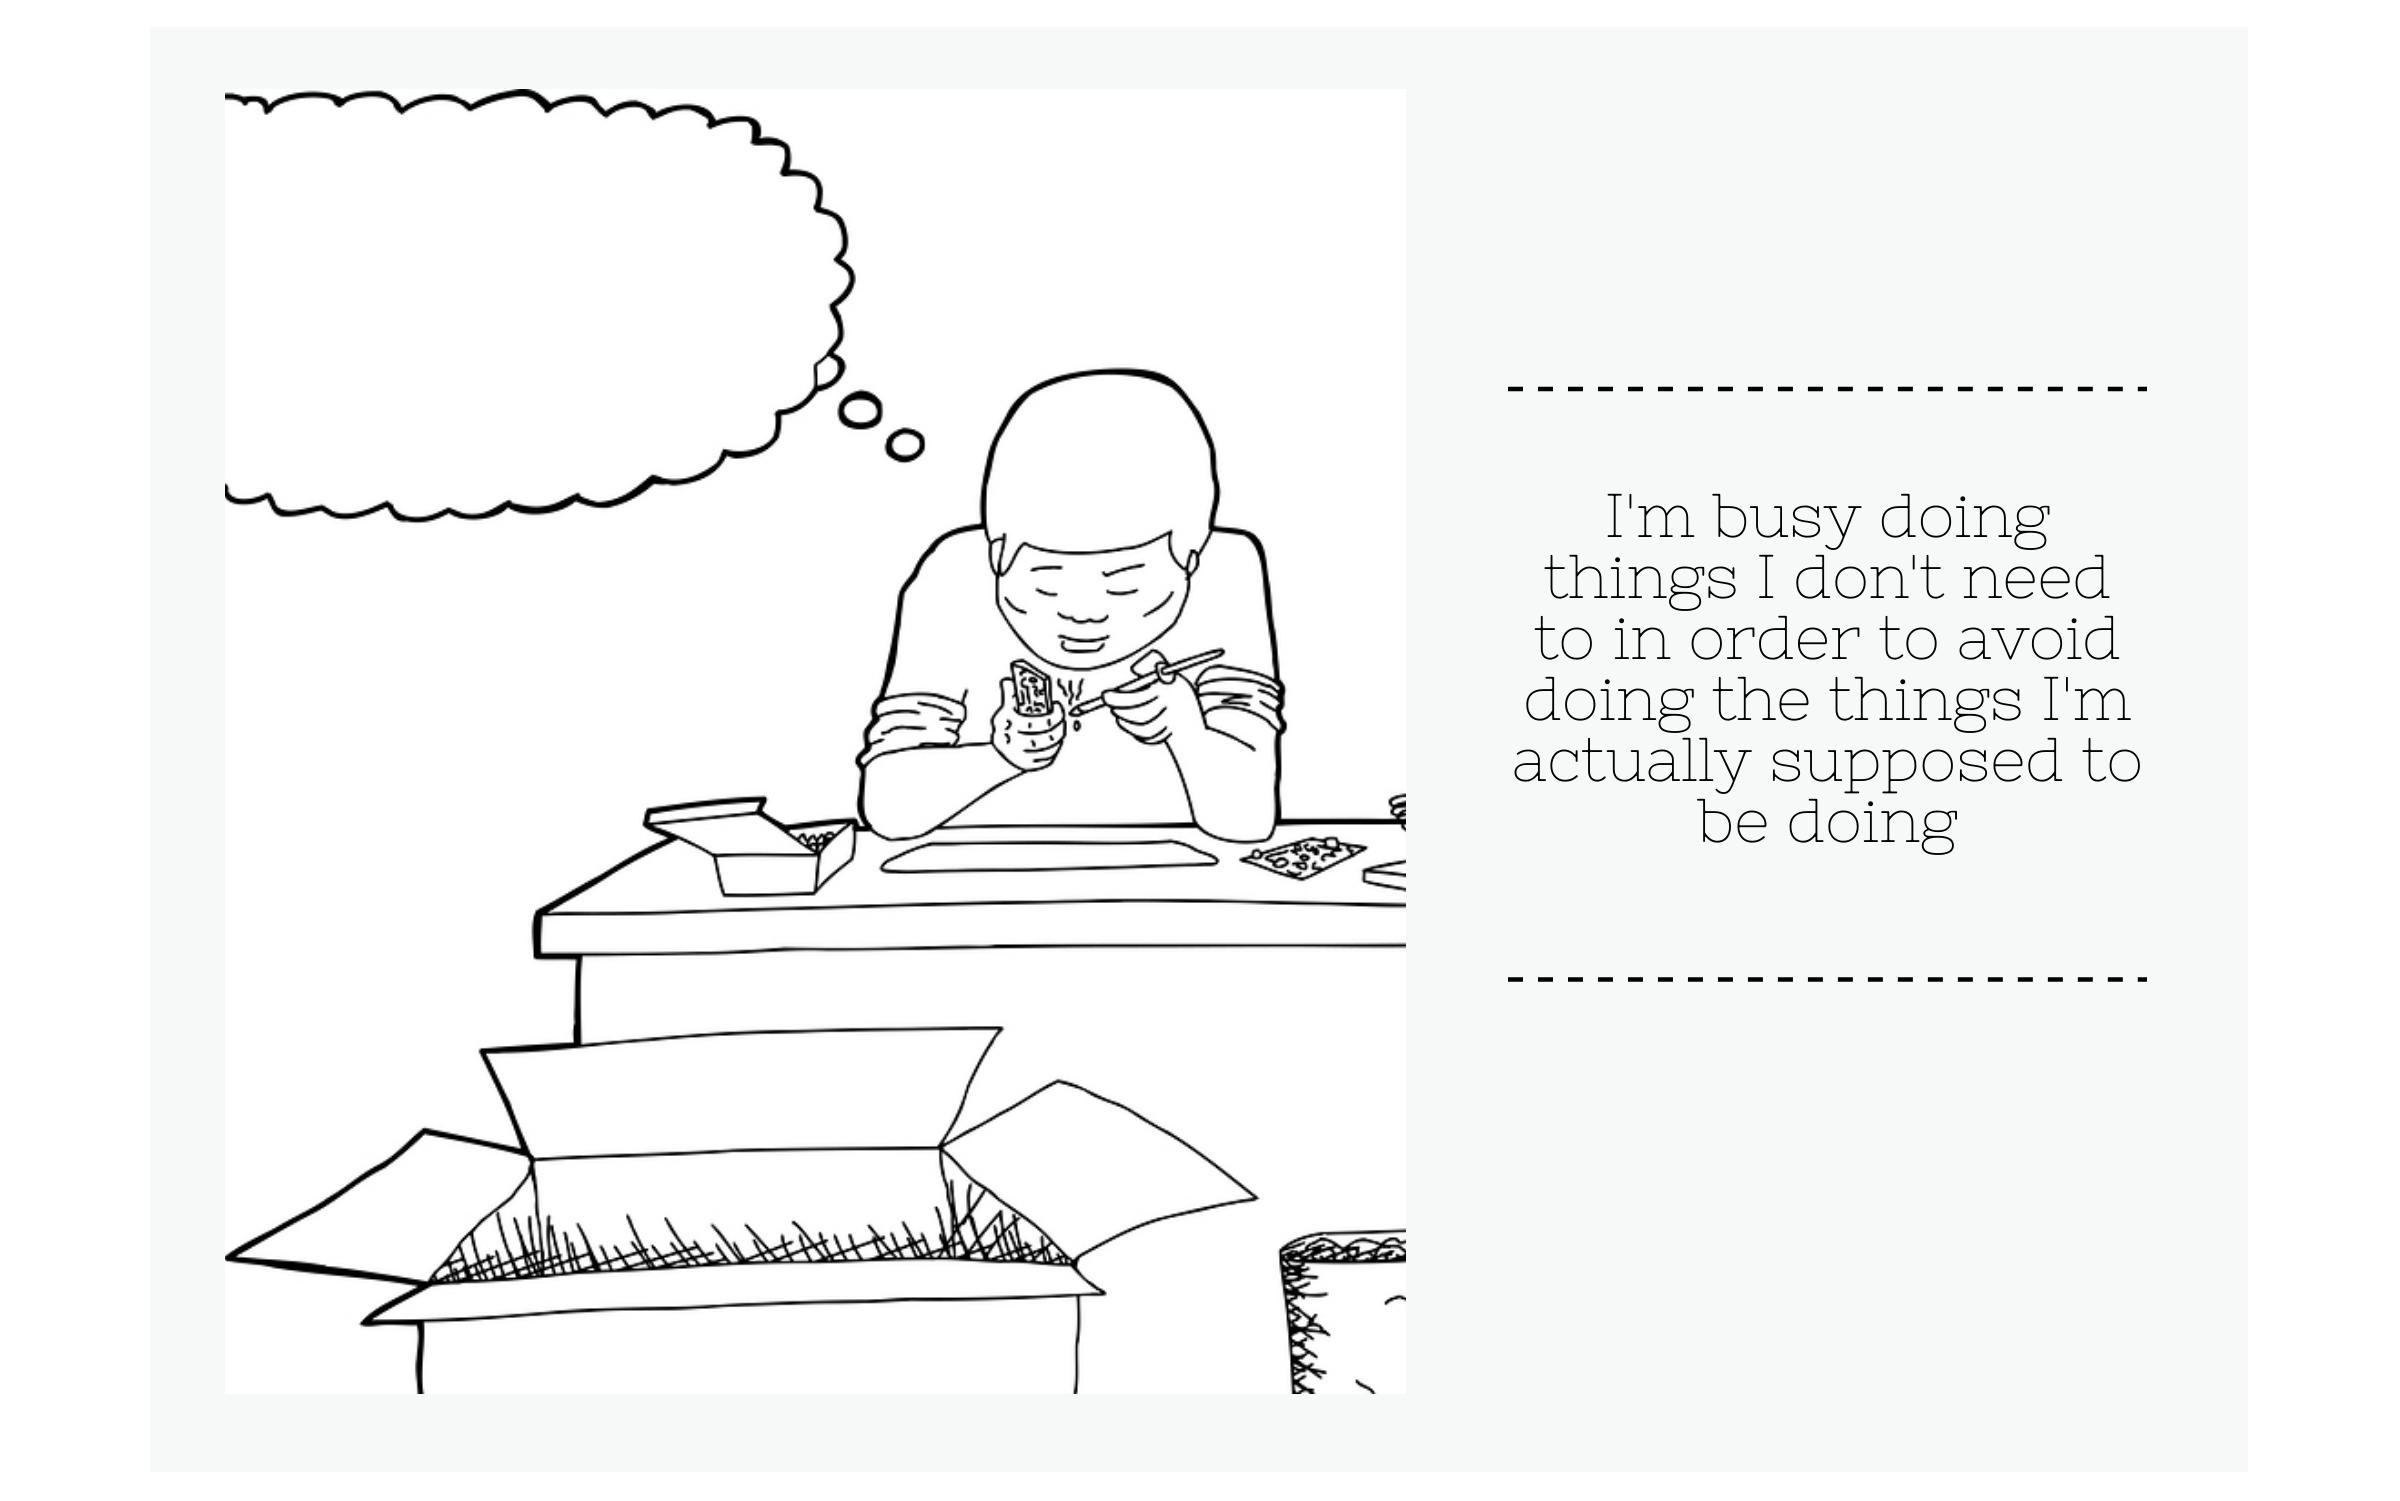 Avoiding tasks procrastination comic